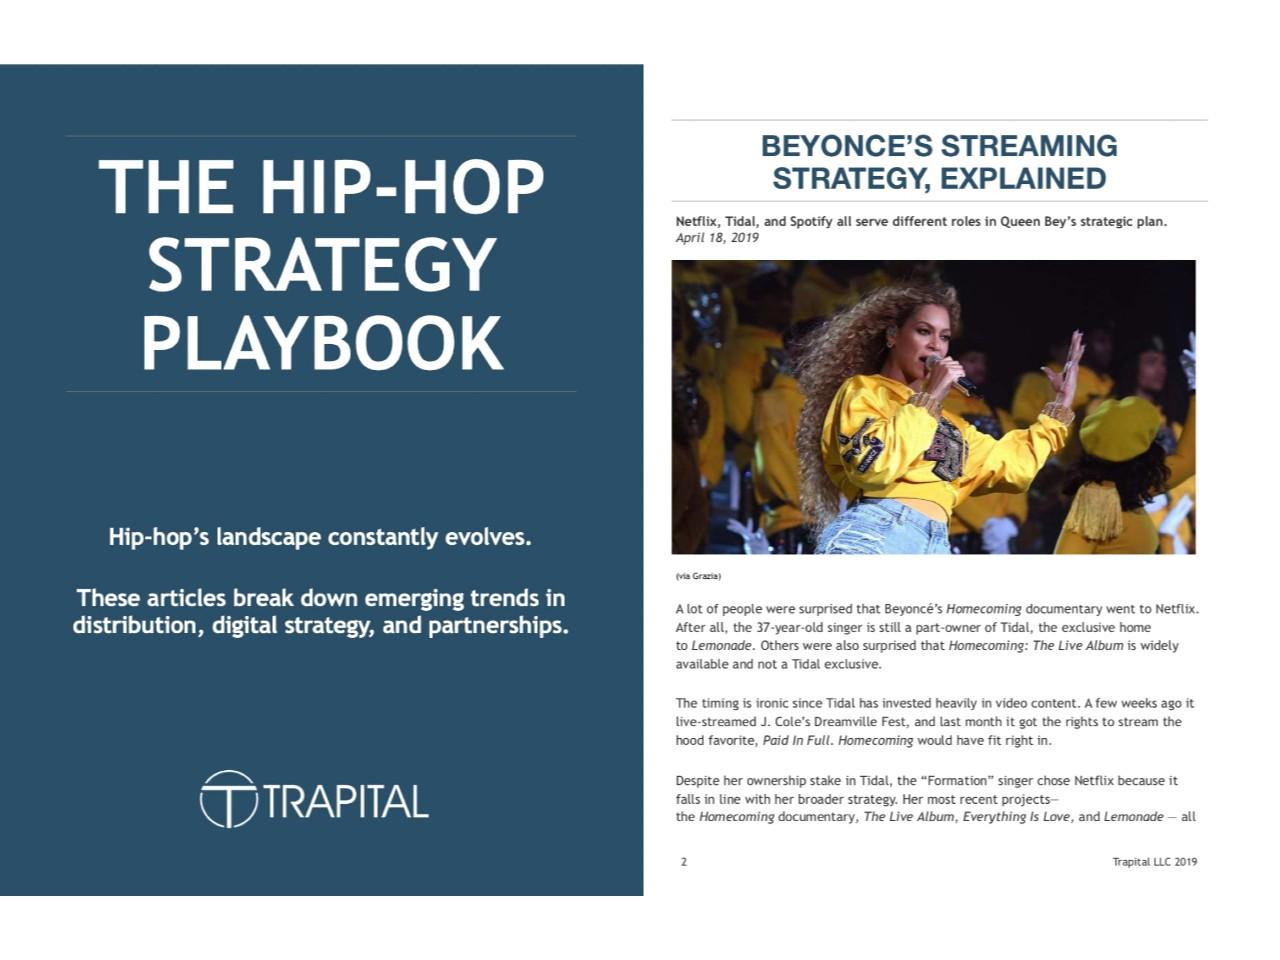 hip-hop-strategy-playbook-trapital